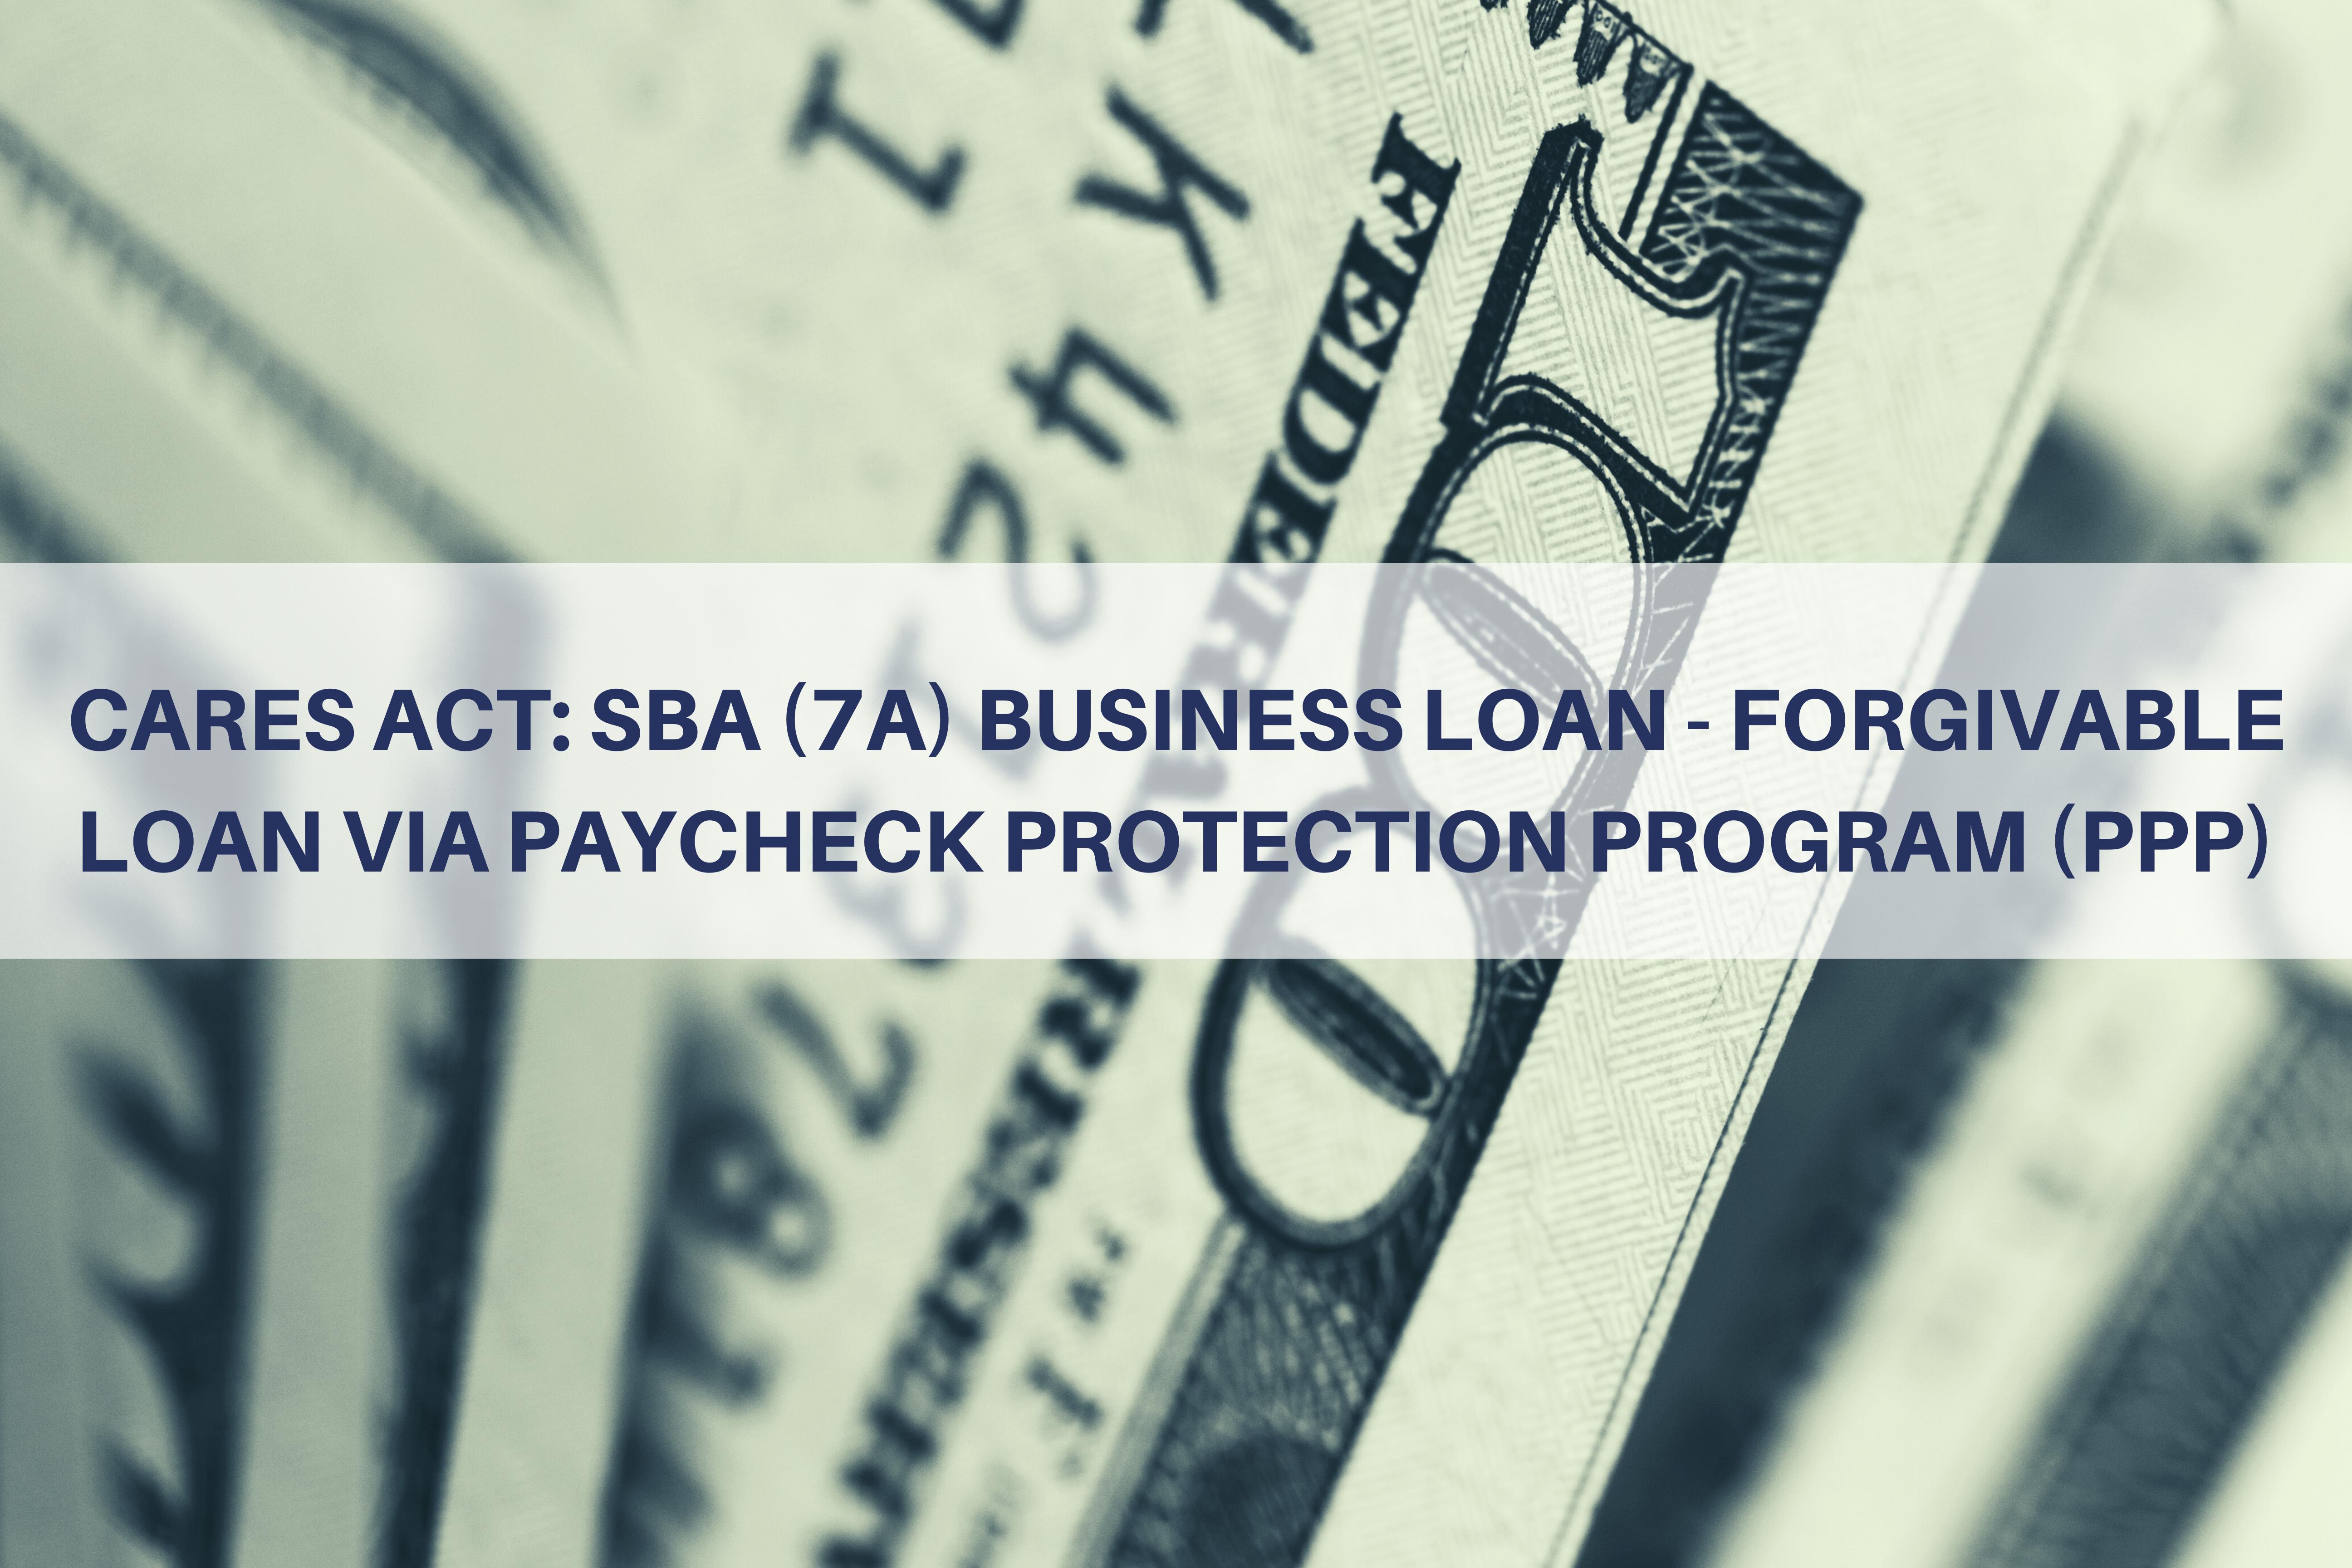 CARES Act: SBA (7a) Business Loan - Forgivable Loan via Paycheck Protection Program (PPP) Thumbnail